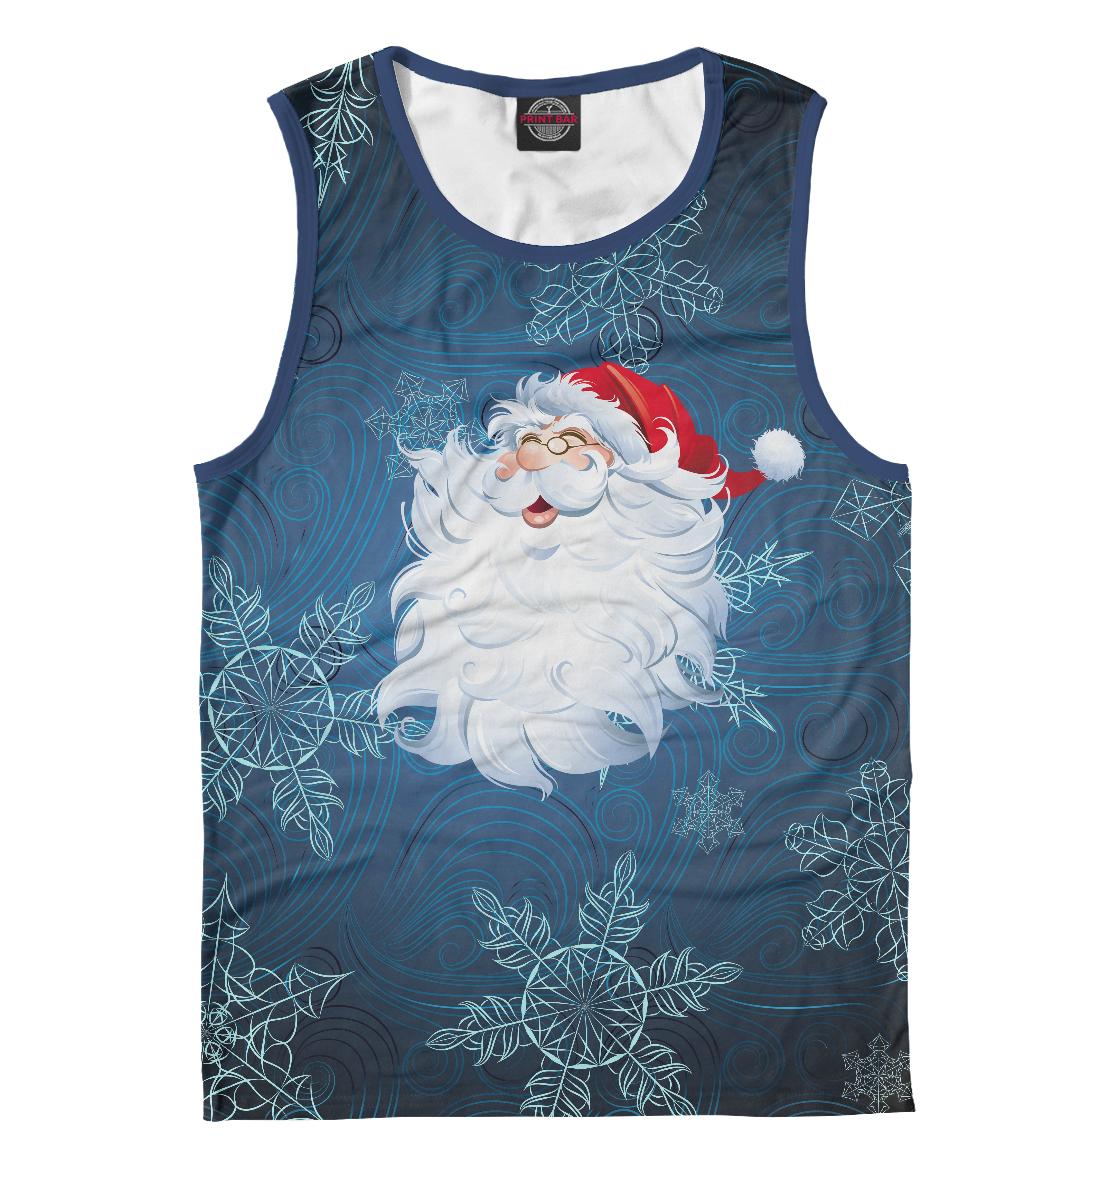 Купить Веселый Дед Мороз, Printbar, Майки, NOV-514464-may-2